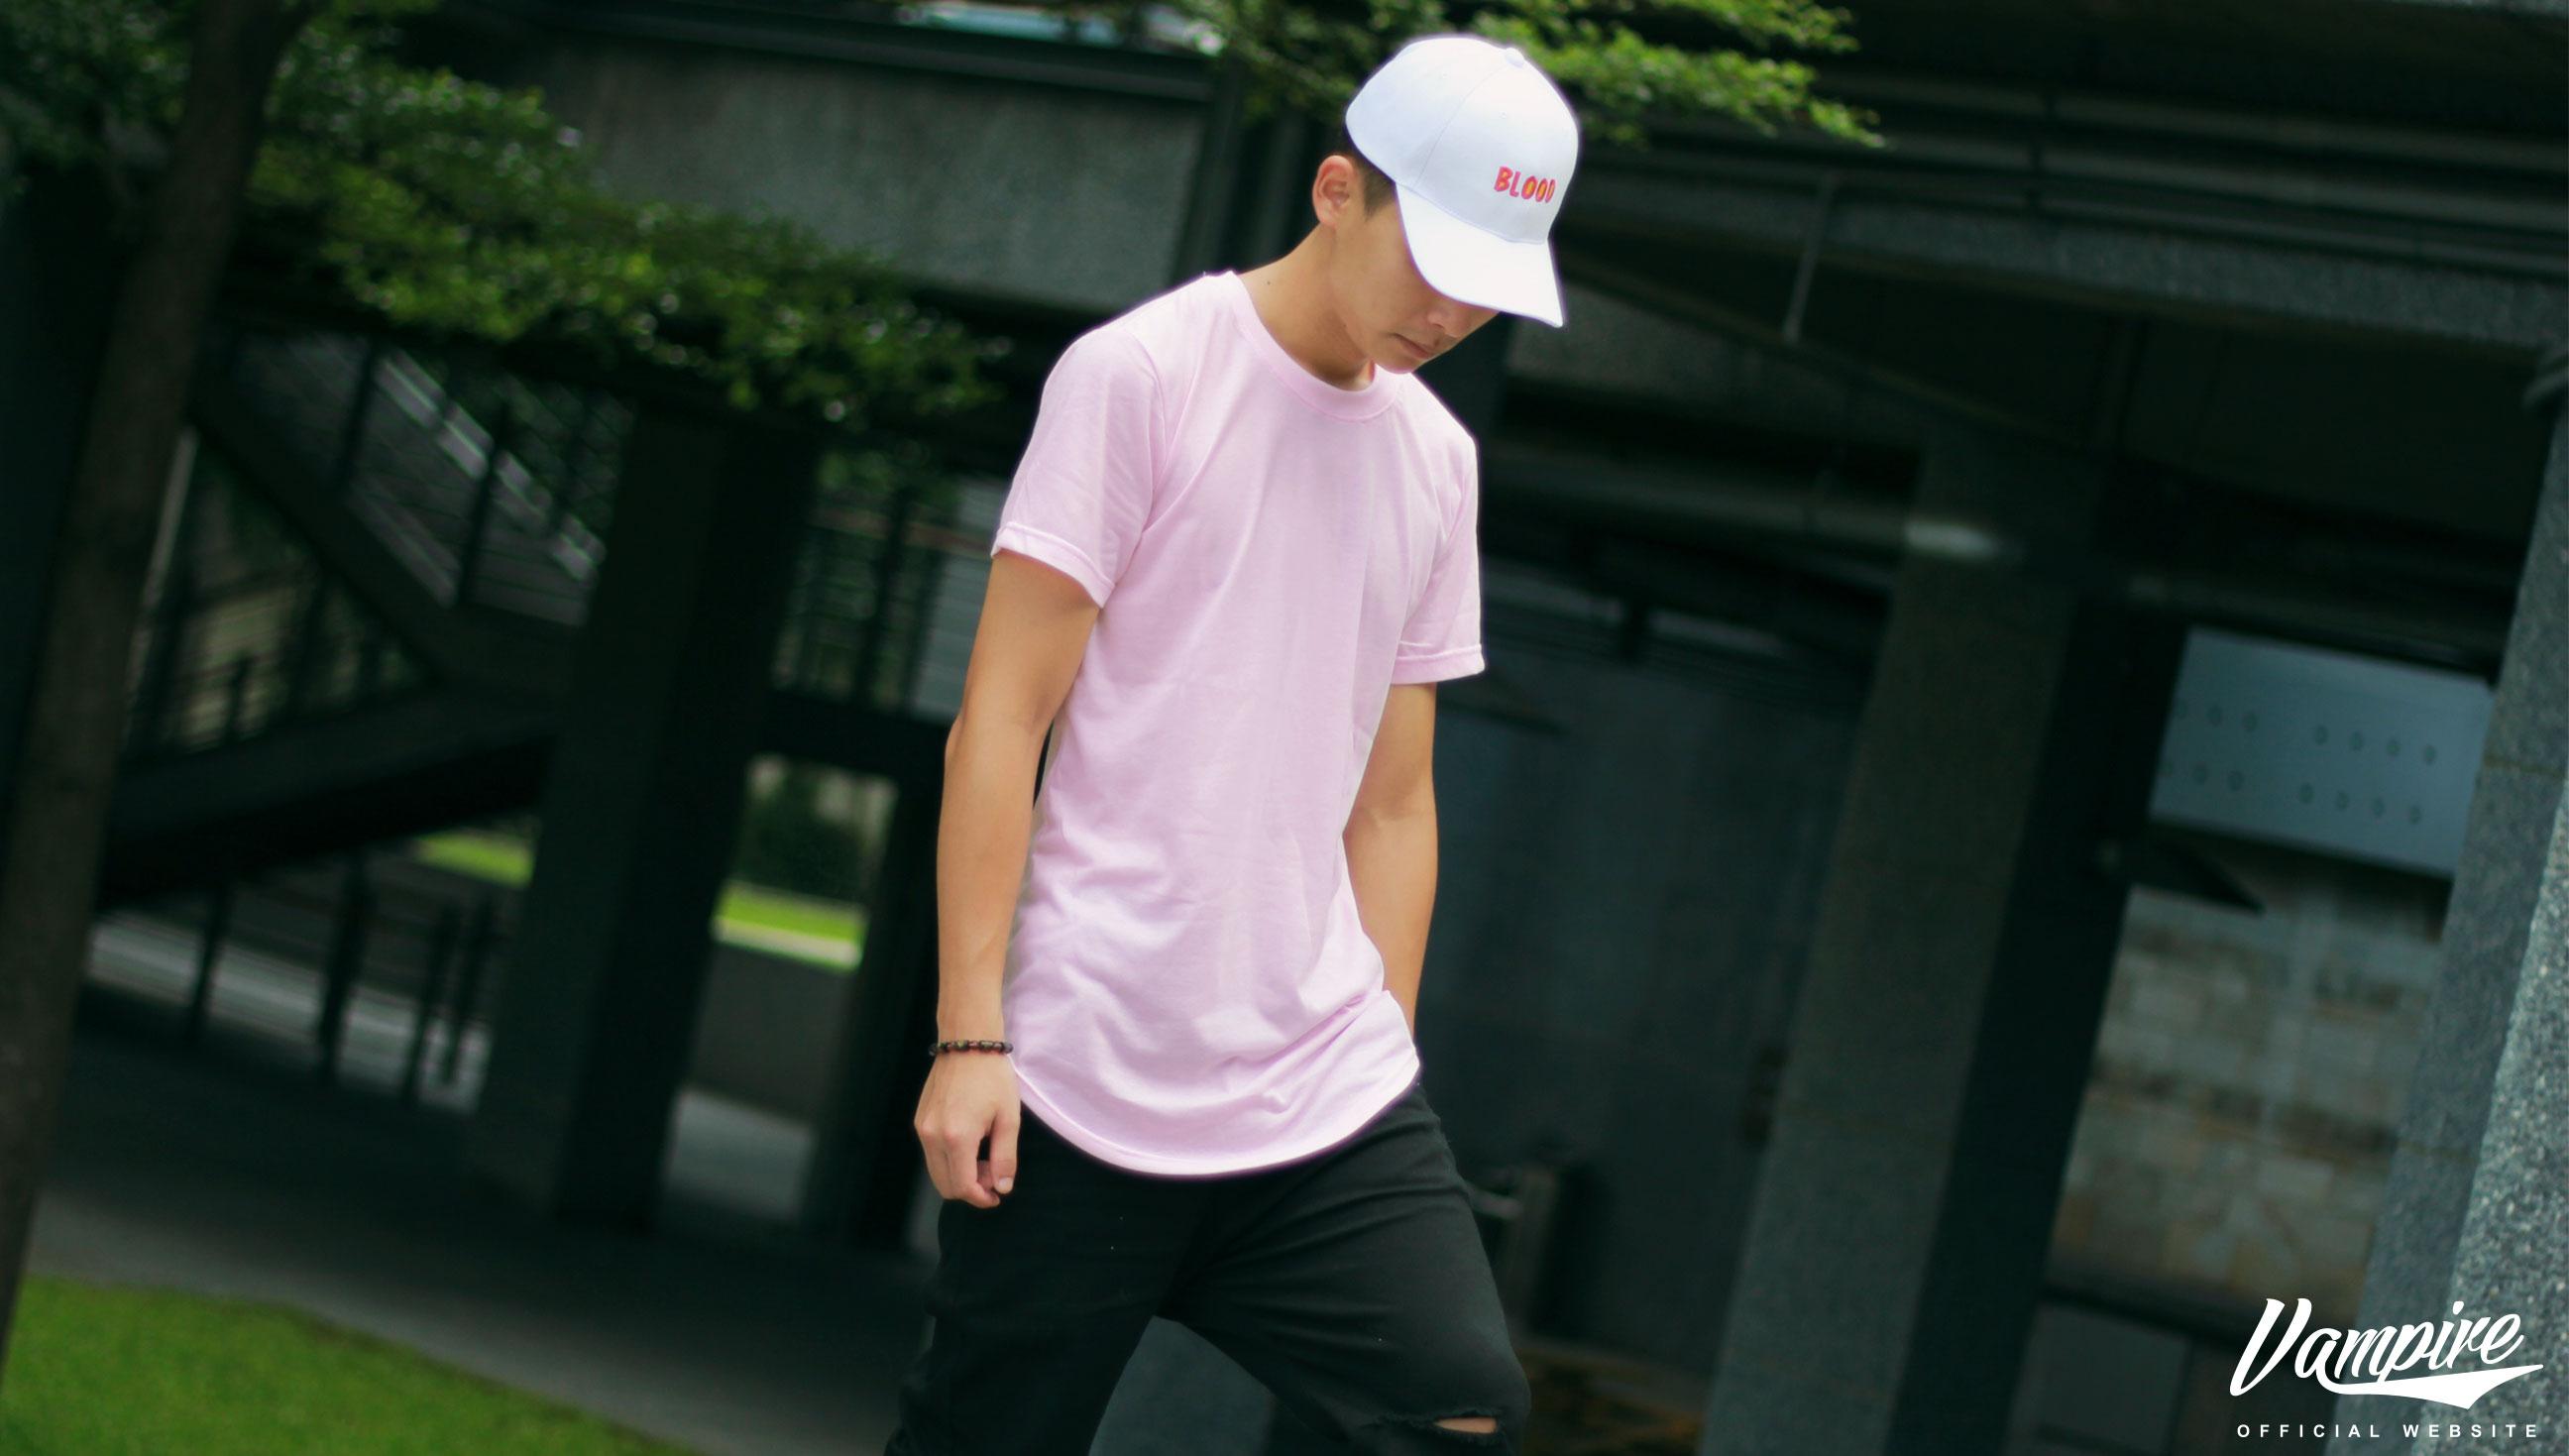 『 FREED ONLINE SHOP 』16 S S 素面長版圓弧 TEE 粉紅色